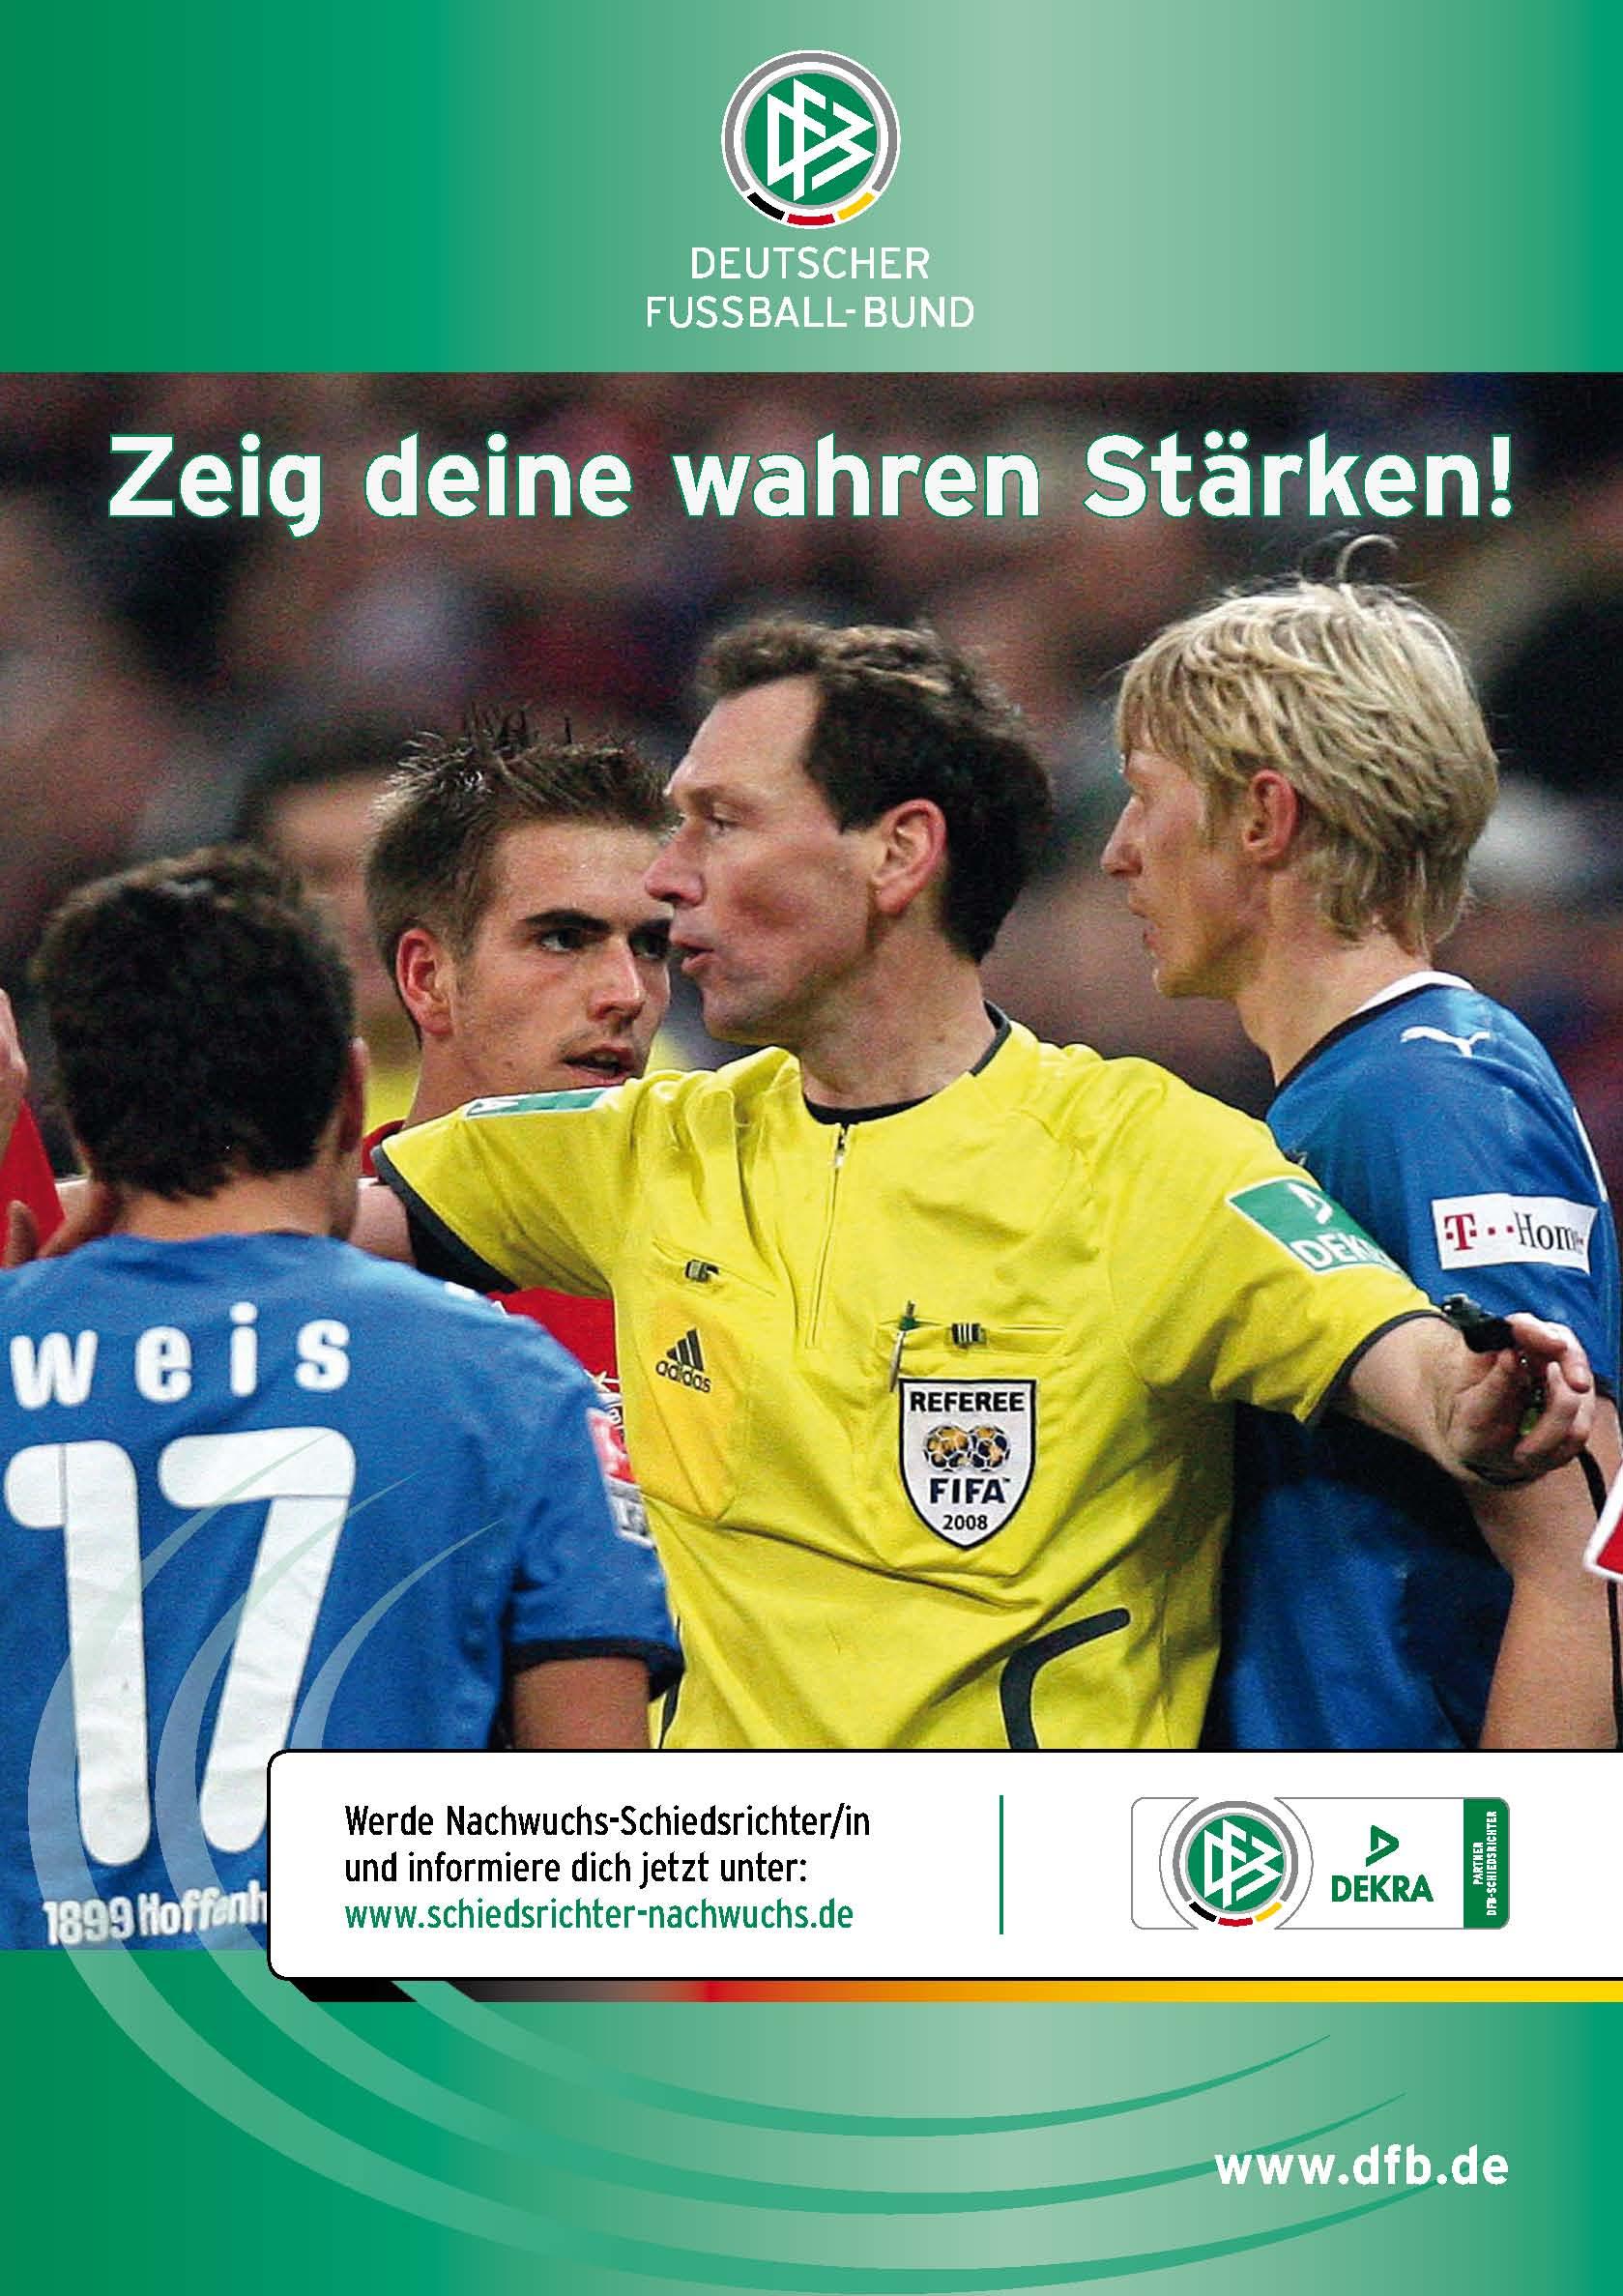 DFB_Plakat-Nachwuchs